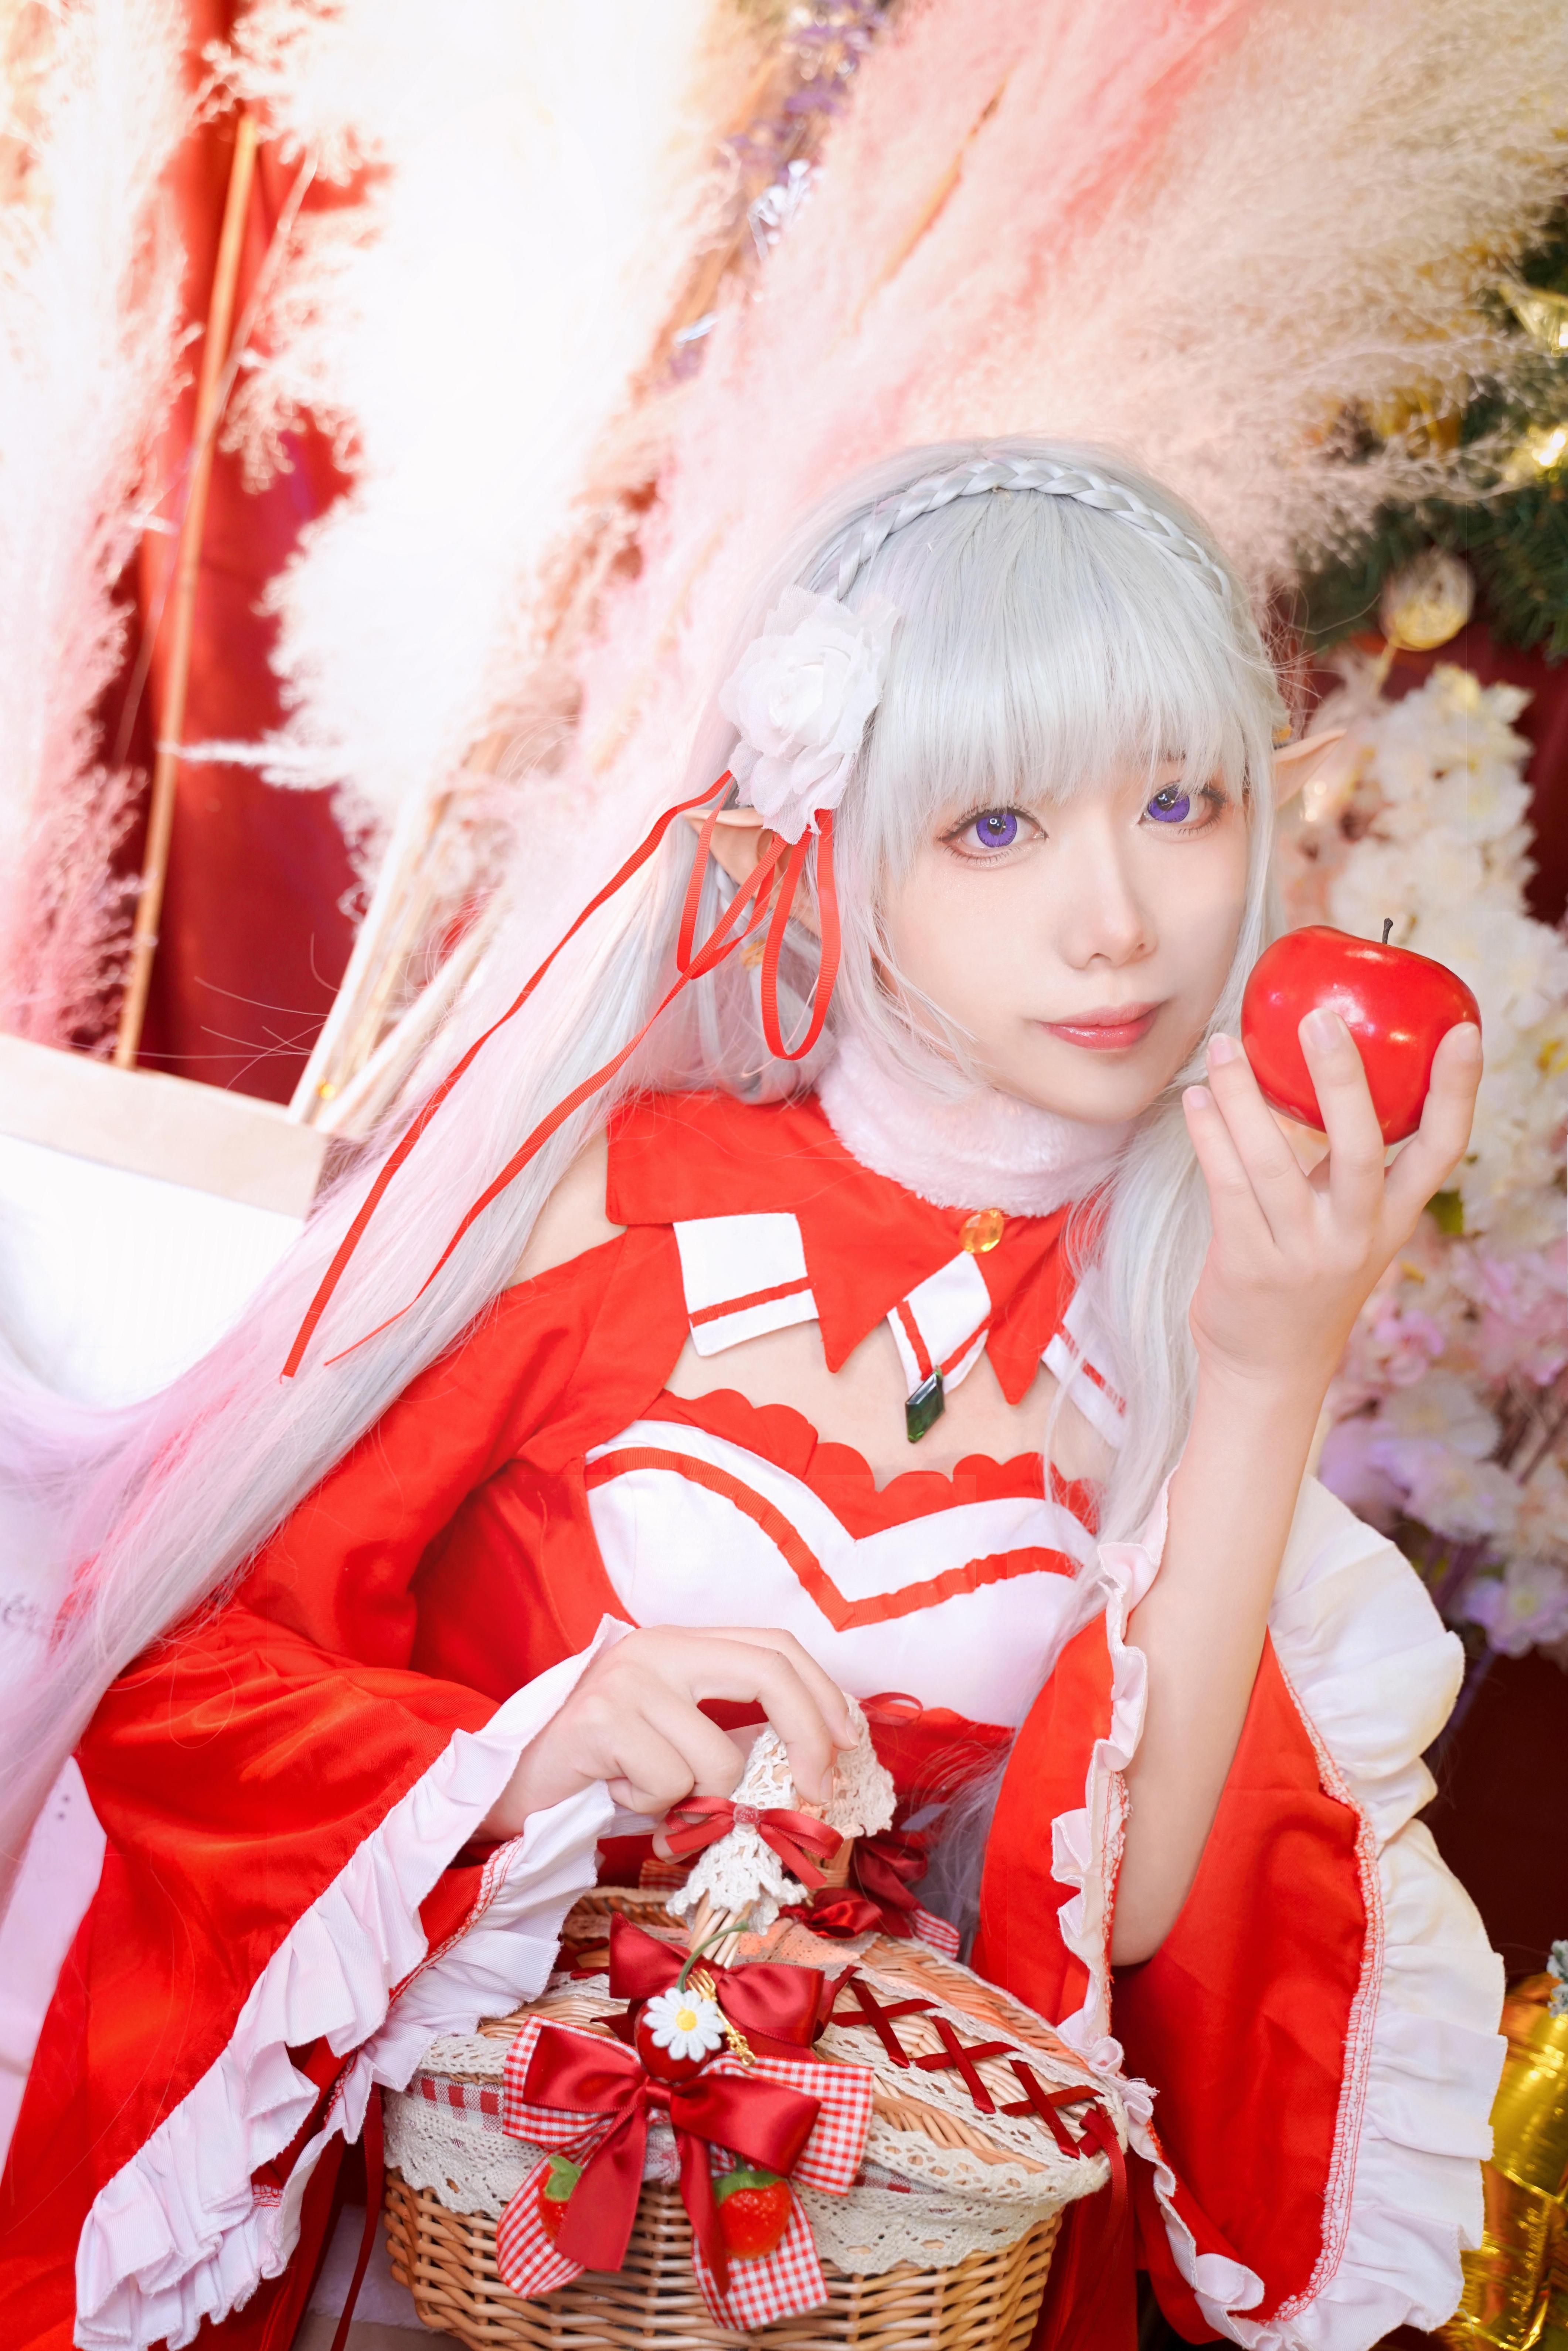 《RE:从零开始的异世界生活》正片cosplay【CN:爱念Aini】-第8张